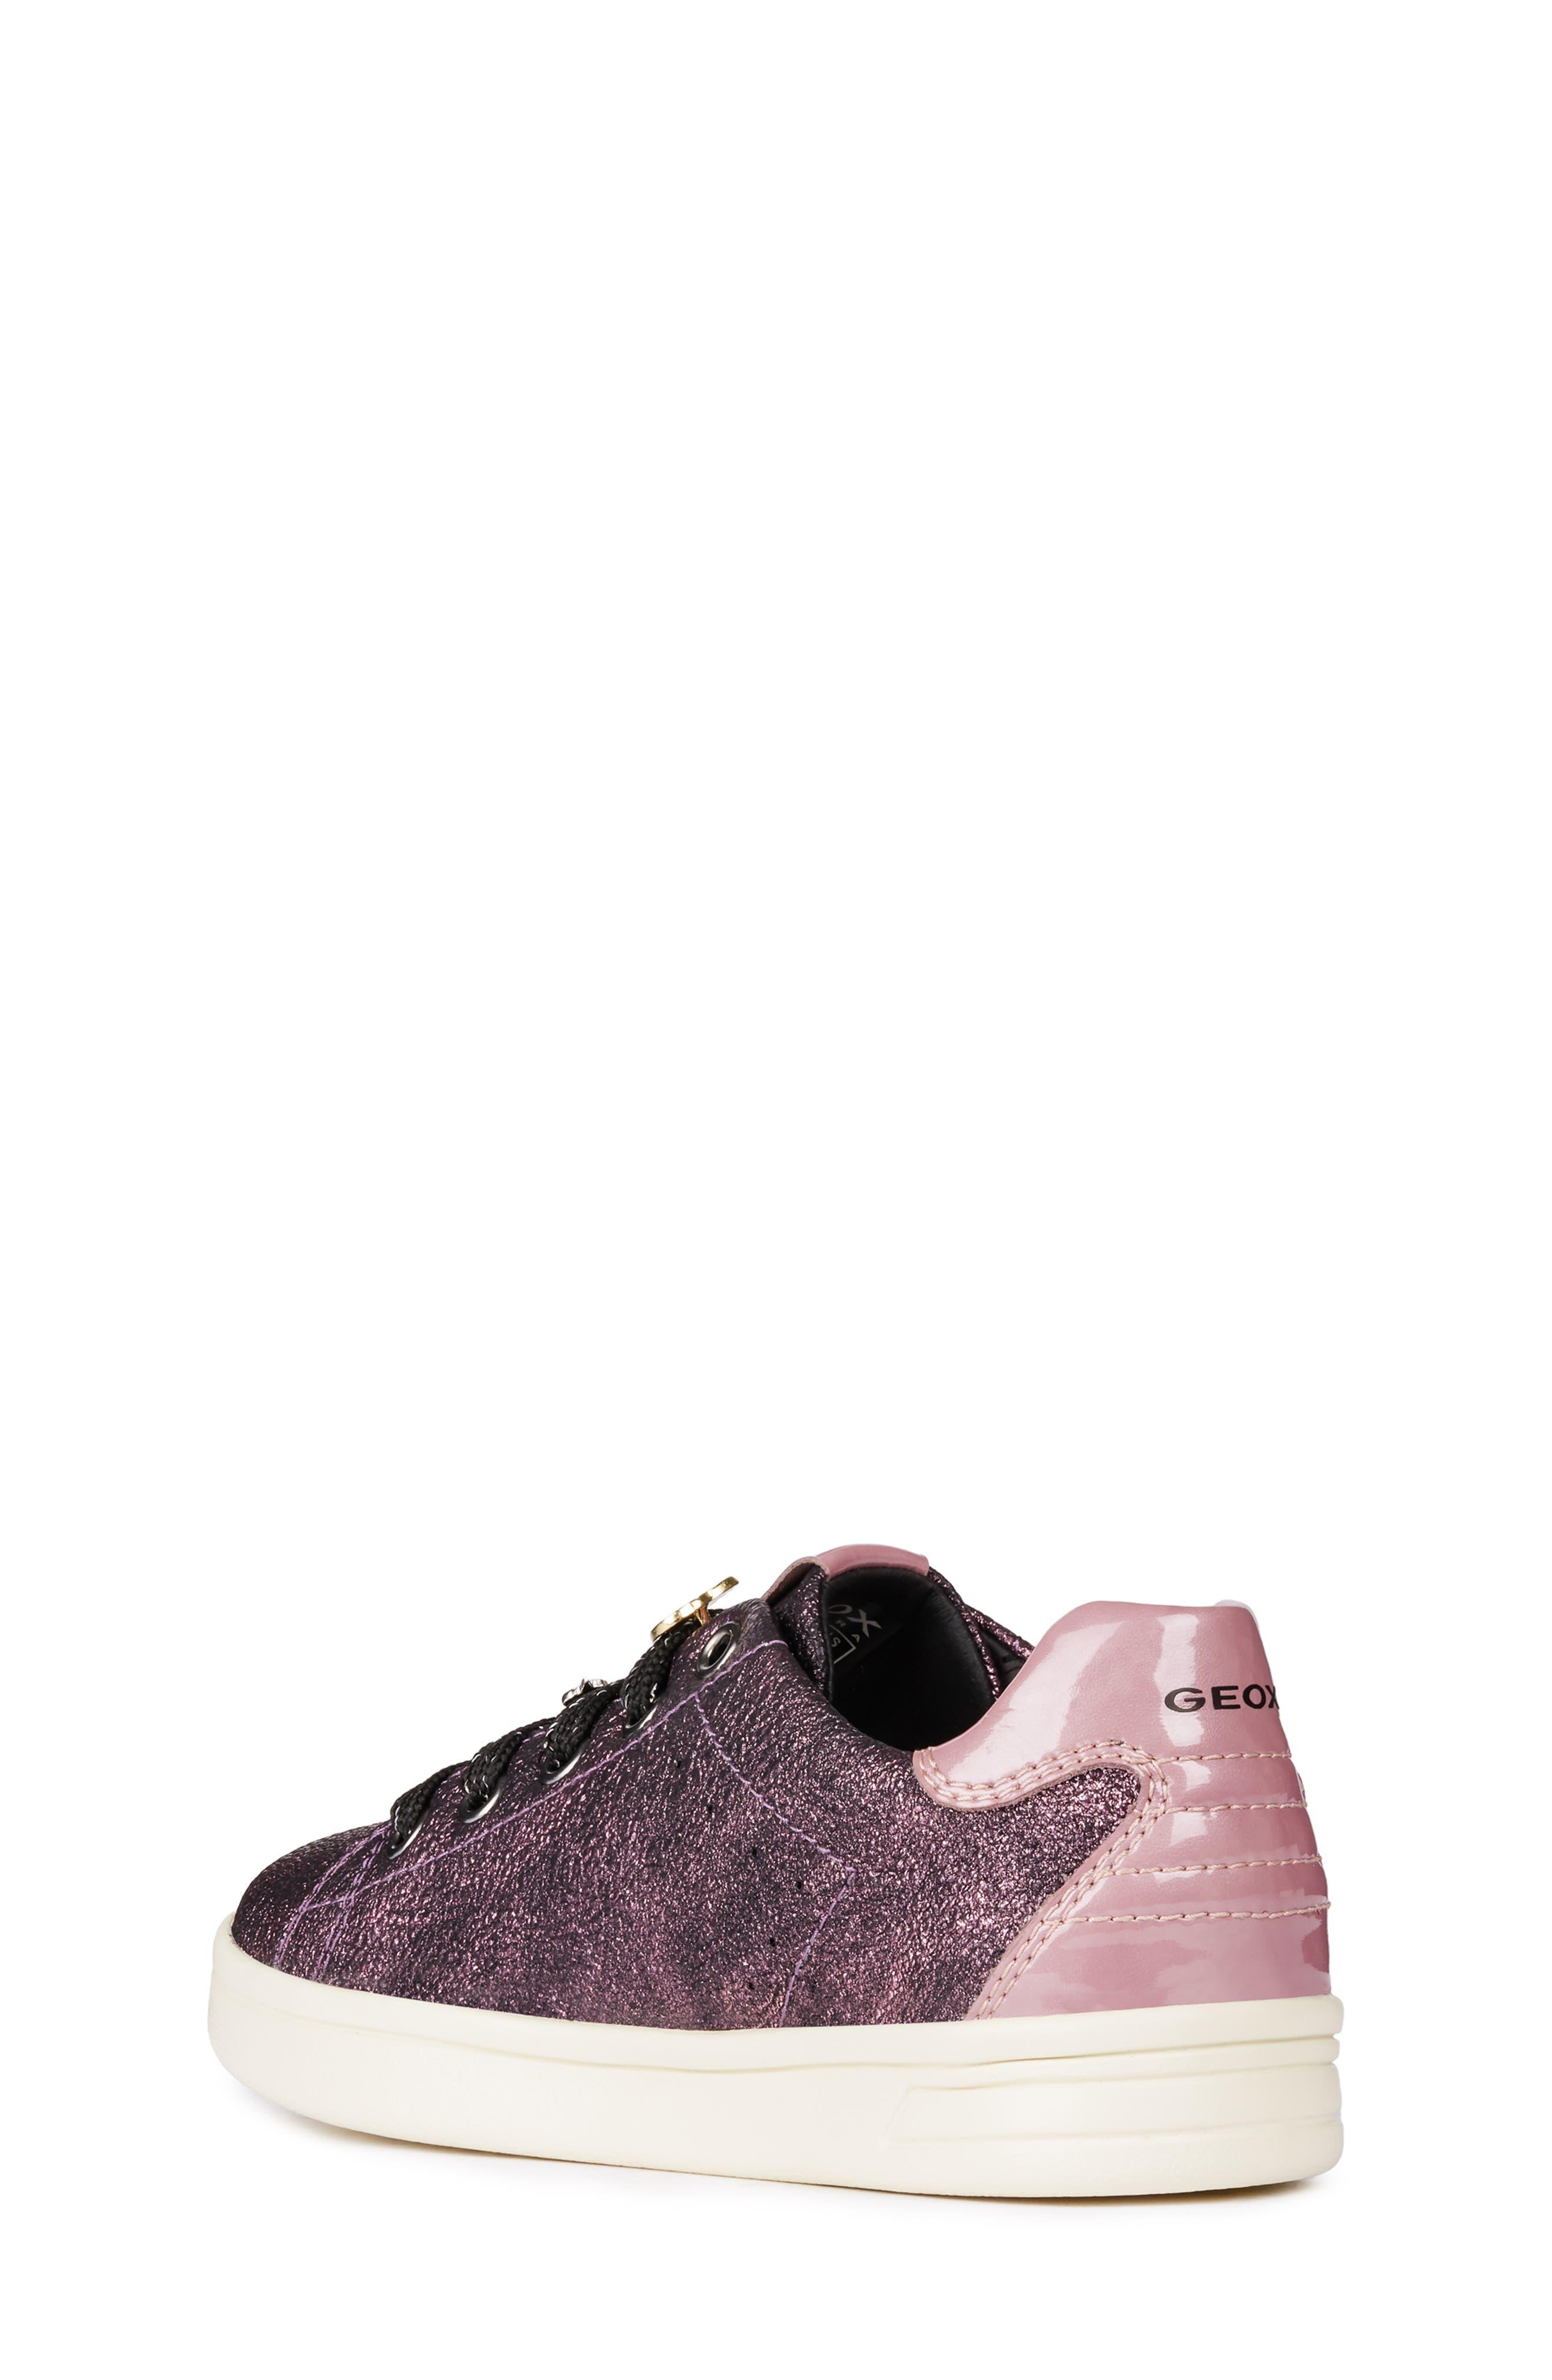 GEOX, DJ Rock Metallic Sneaker, Alternate thumbnail 2, color, DARK ROSE